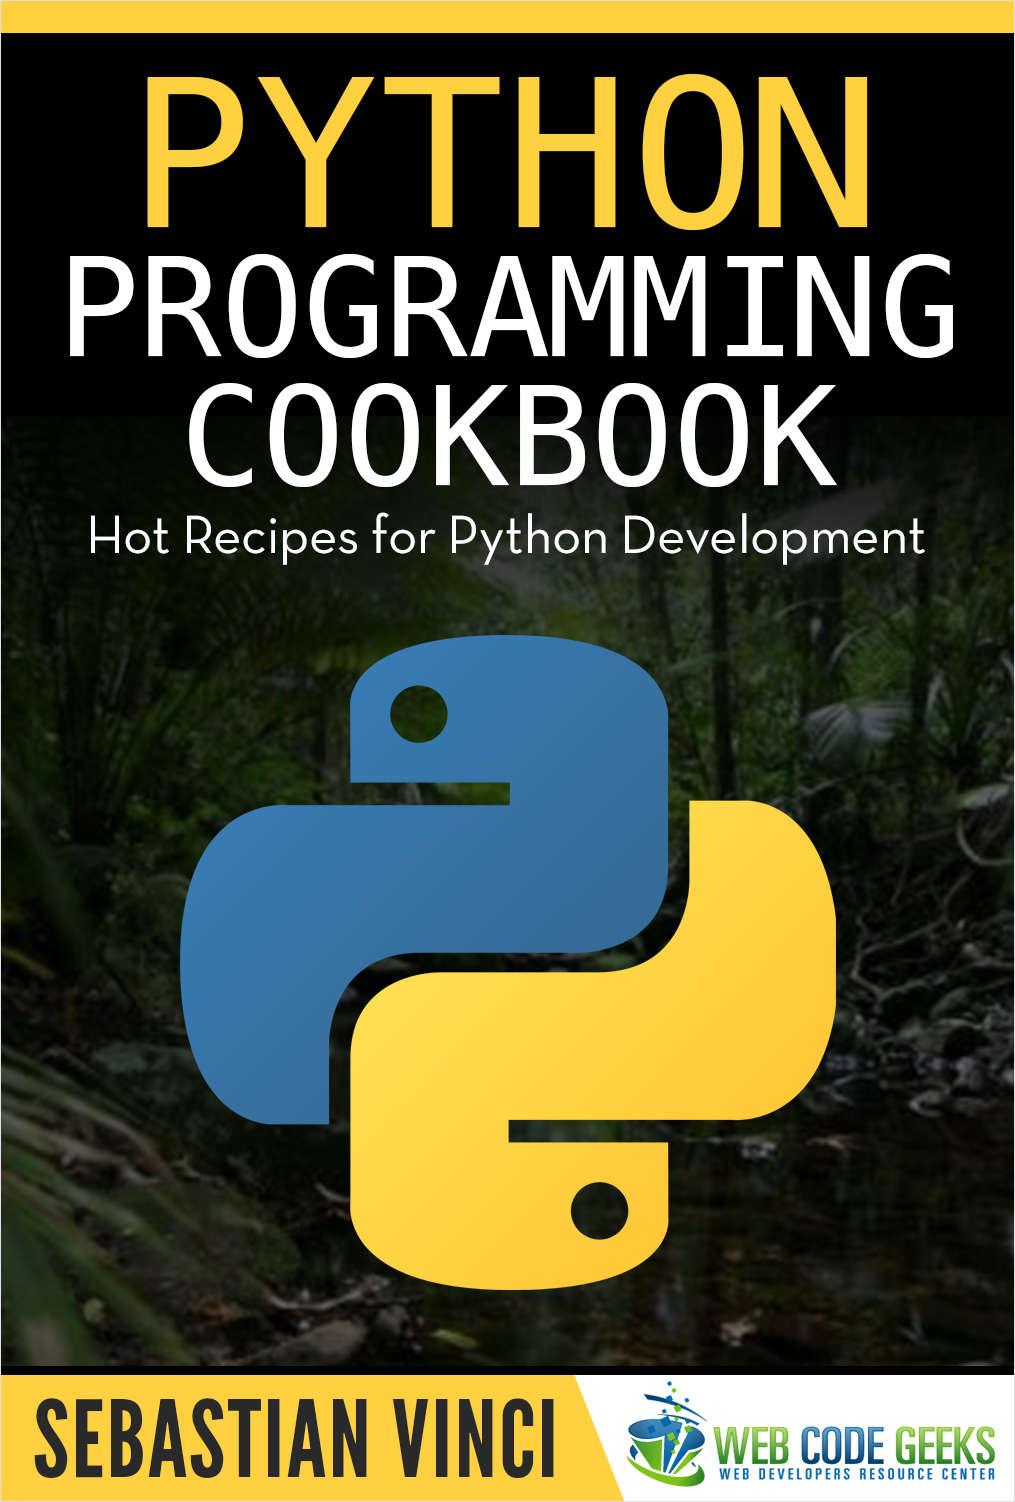 Python Programming Cookbook